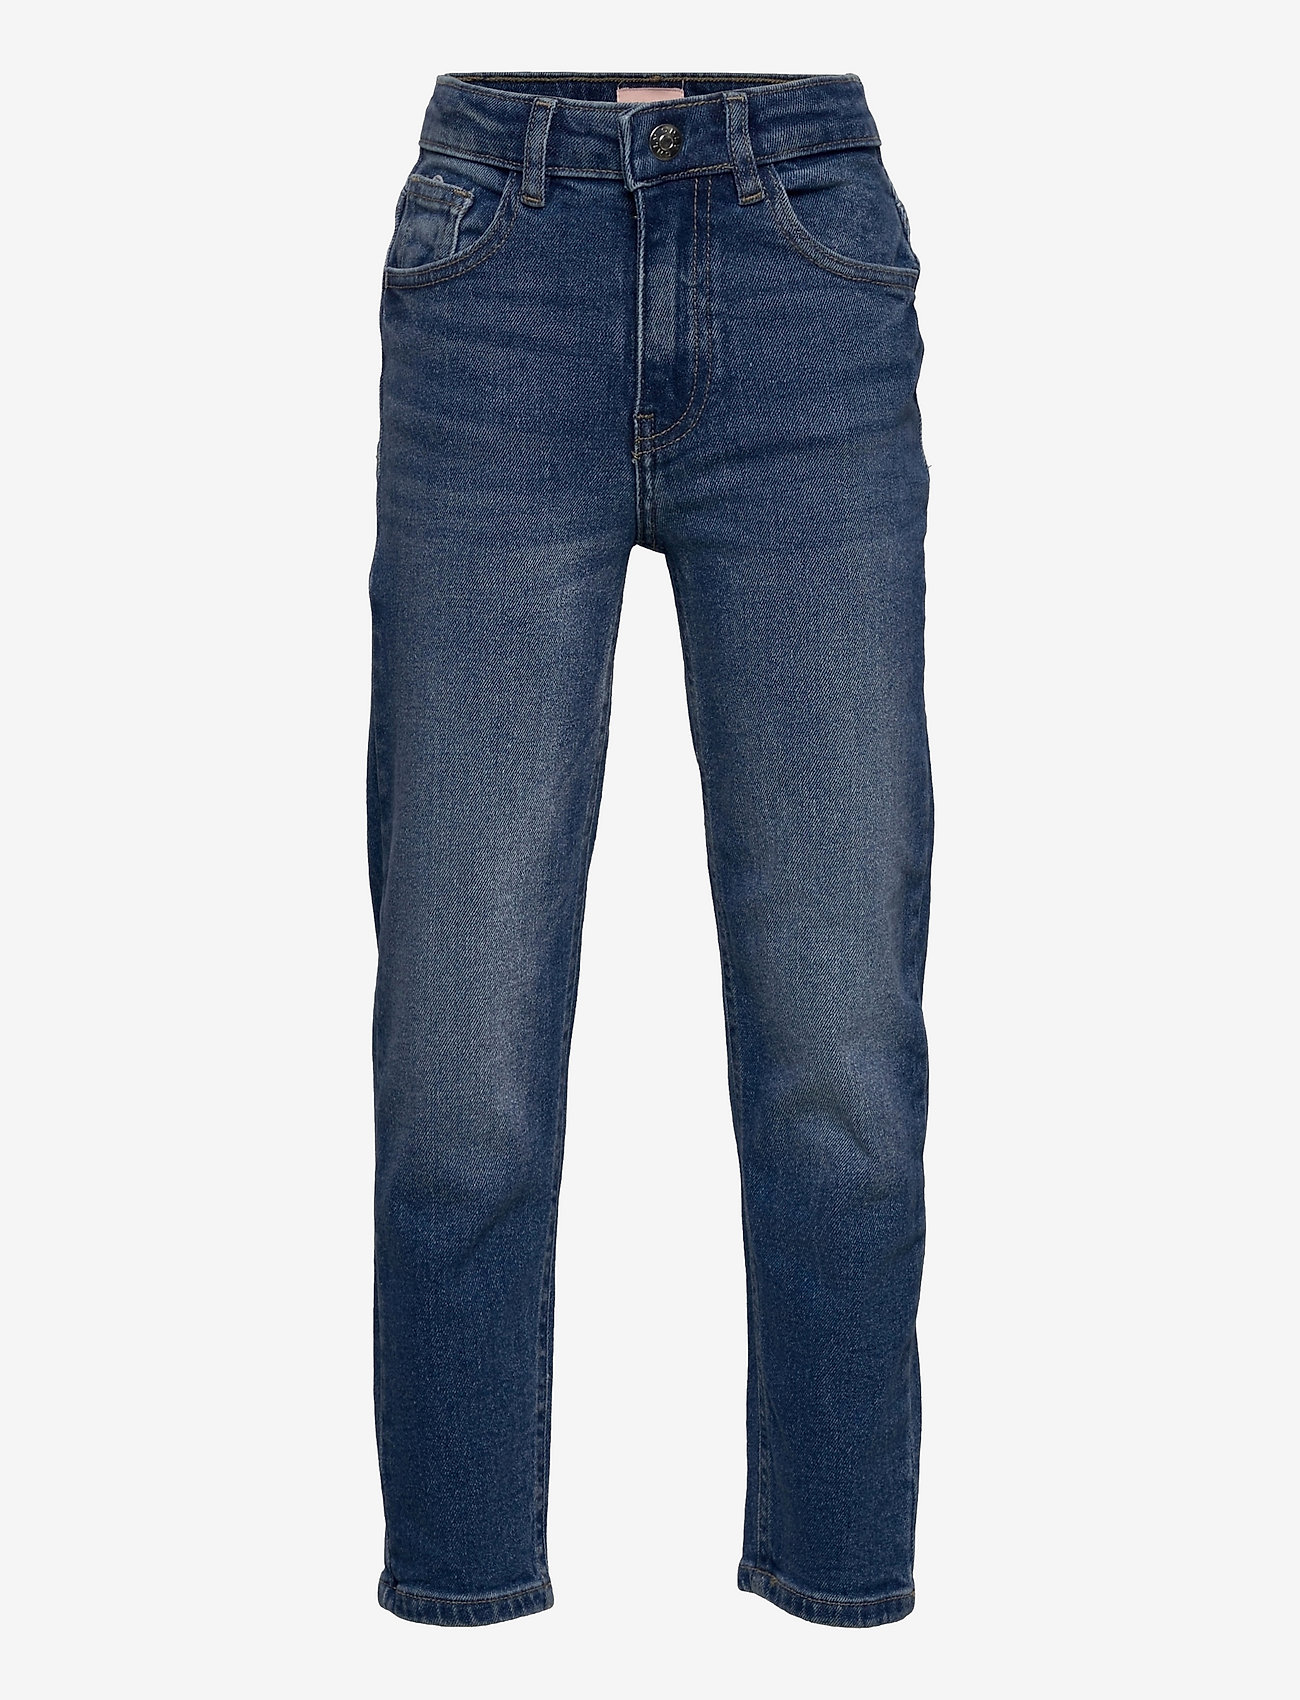 Kids Only - KONCALLA LIFE MOM FIT DNM AZG159 - jeans - medium blue denim - 0